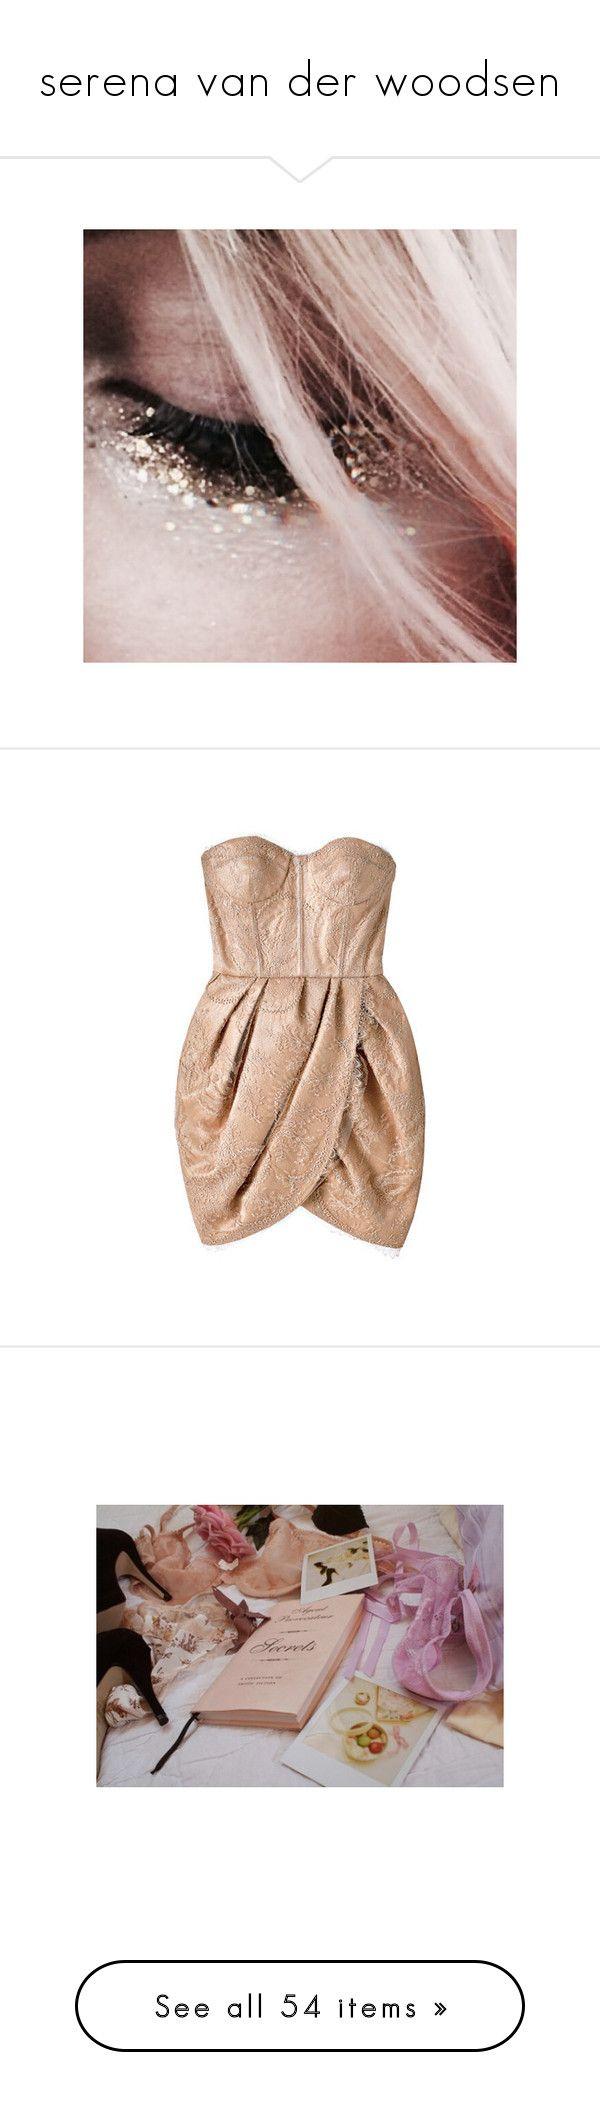 """serena van der woodsen"" by rosepunzels ❤ liked on Polyvore featuring tops, heart tops, brown top, dresses, vestidos, short dresses, платья, ruffle mini dress, floral dresses and summer day dresses"